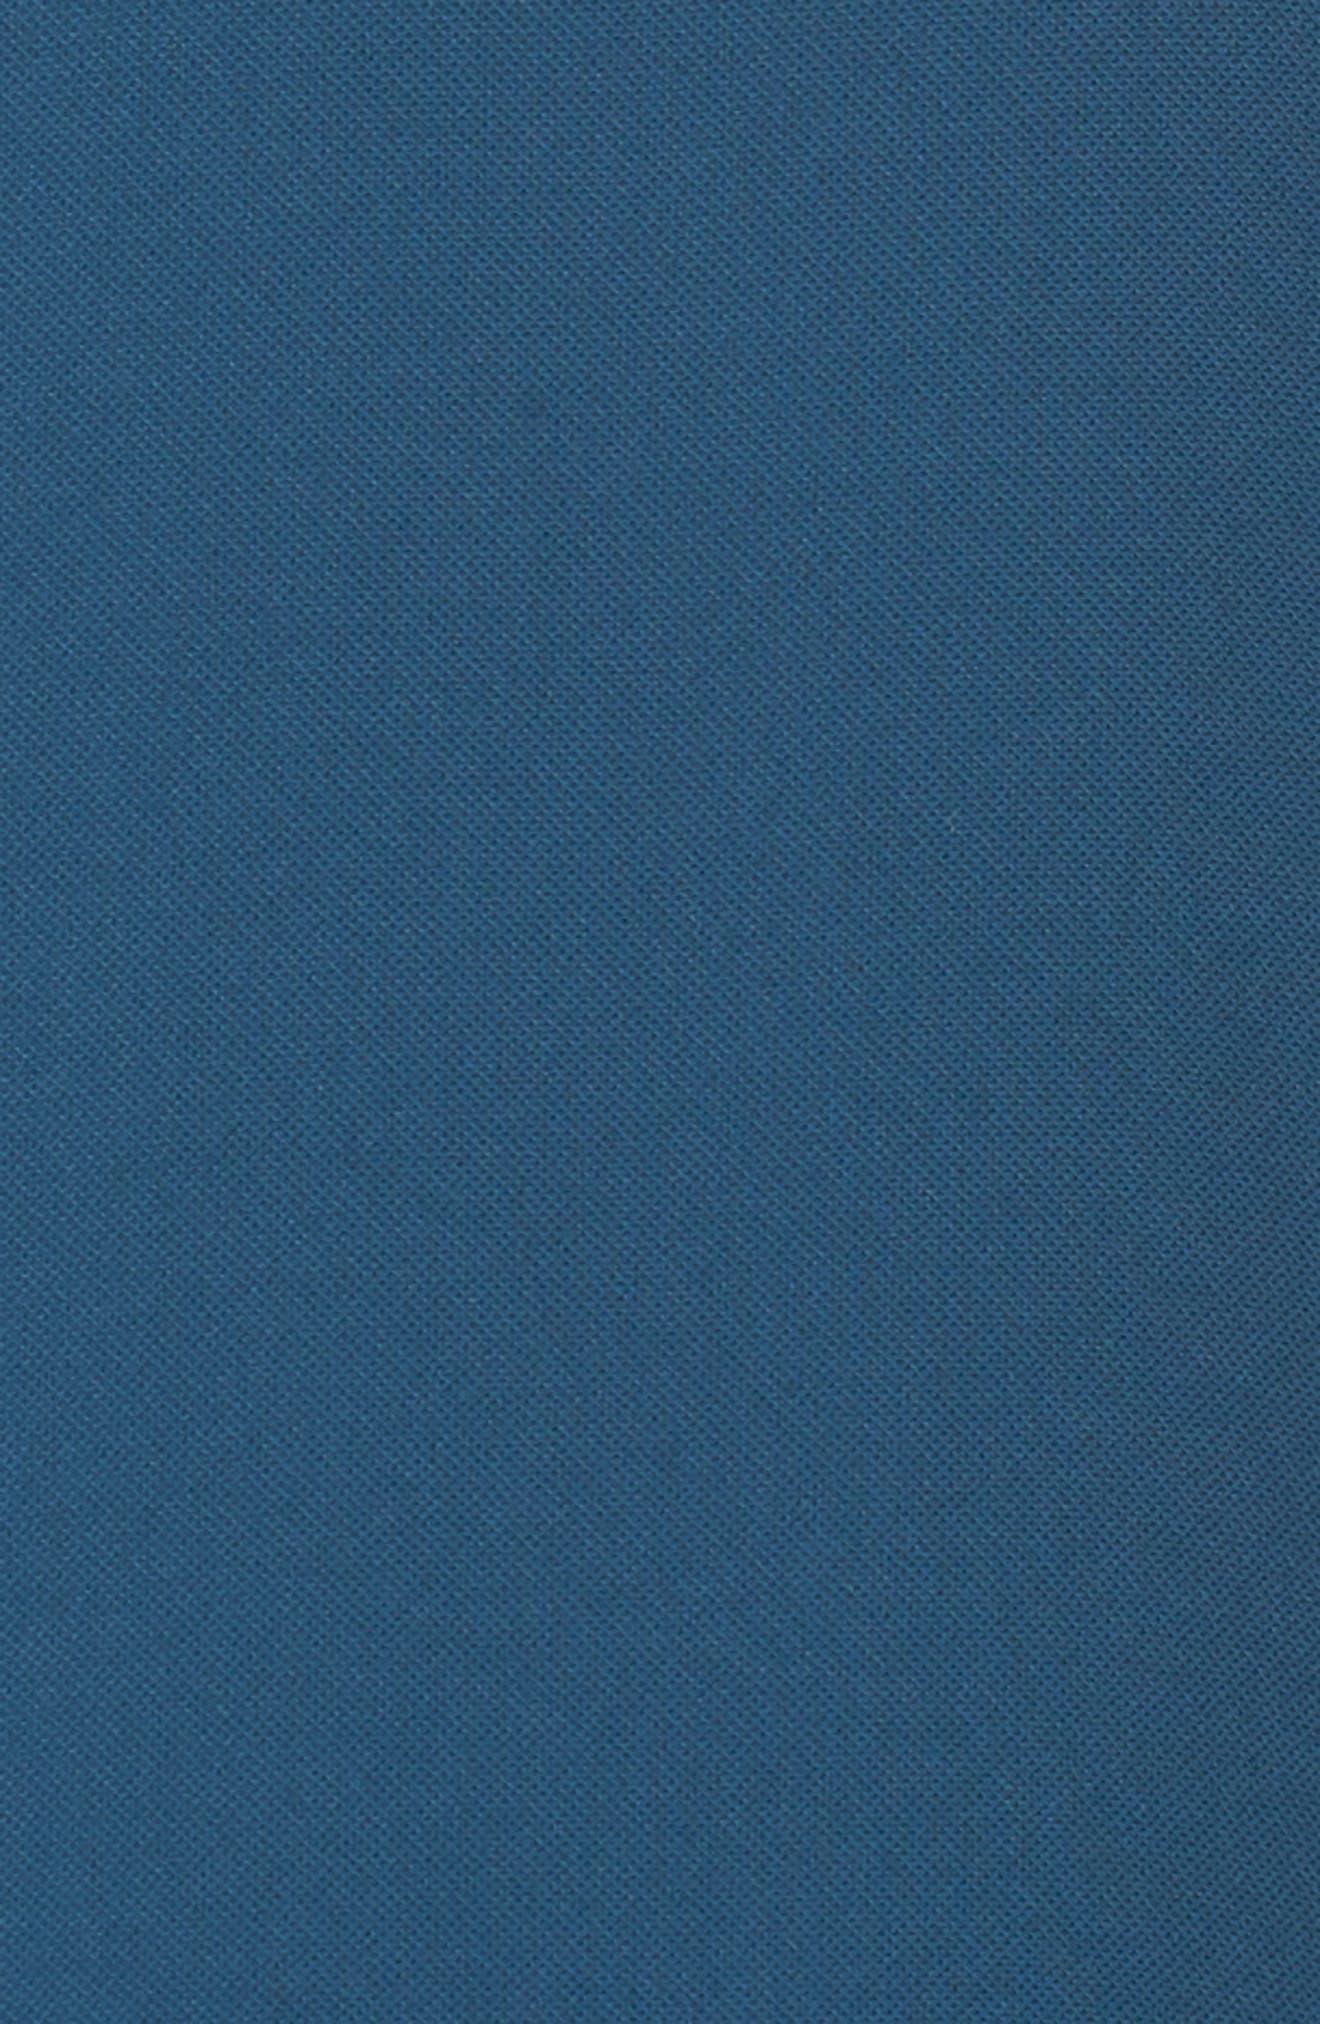 Gauzy One-Shoulder Crepe Dress,                             Alternate thumbnail 5, color,                             471